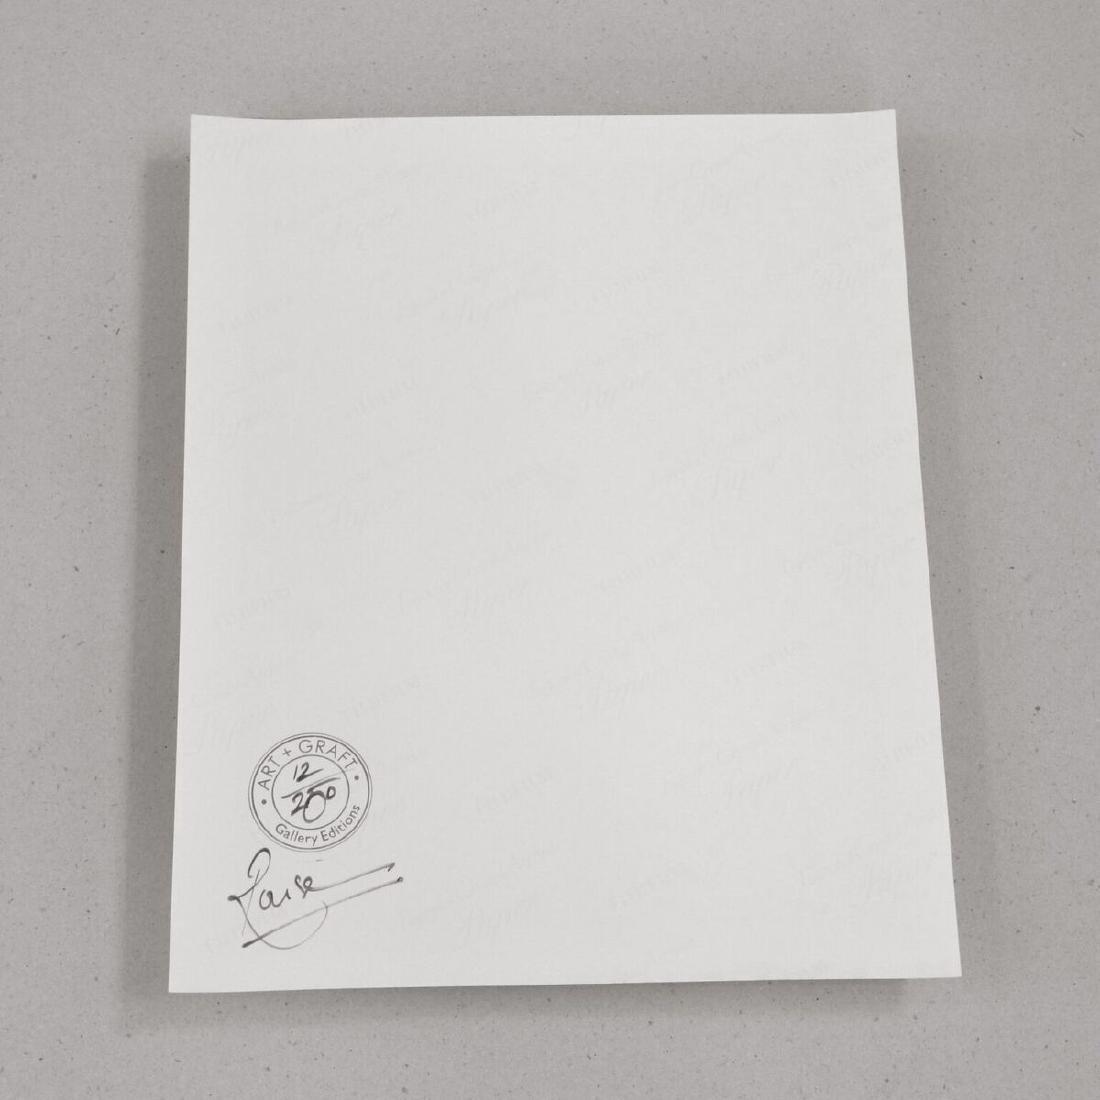 Dominic Rouse Chromogenic Print Ecce Homo - 5